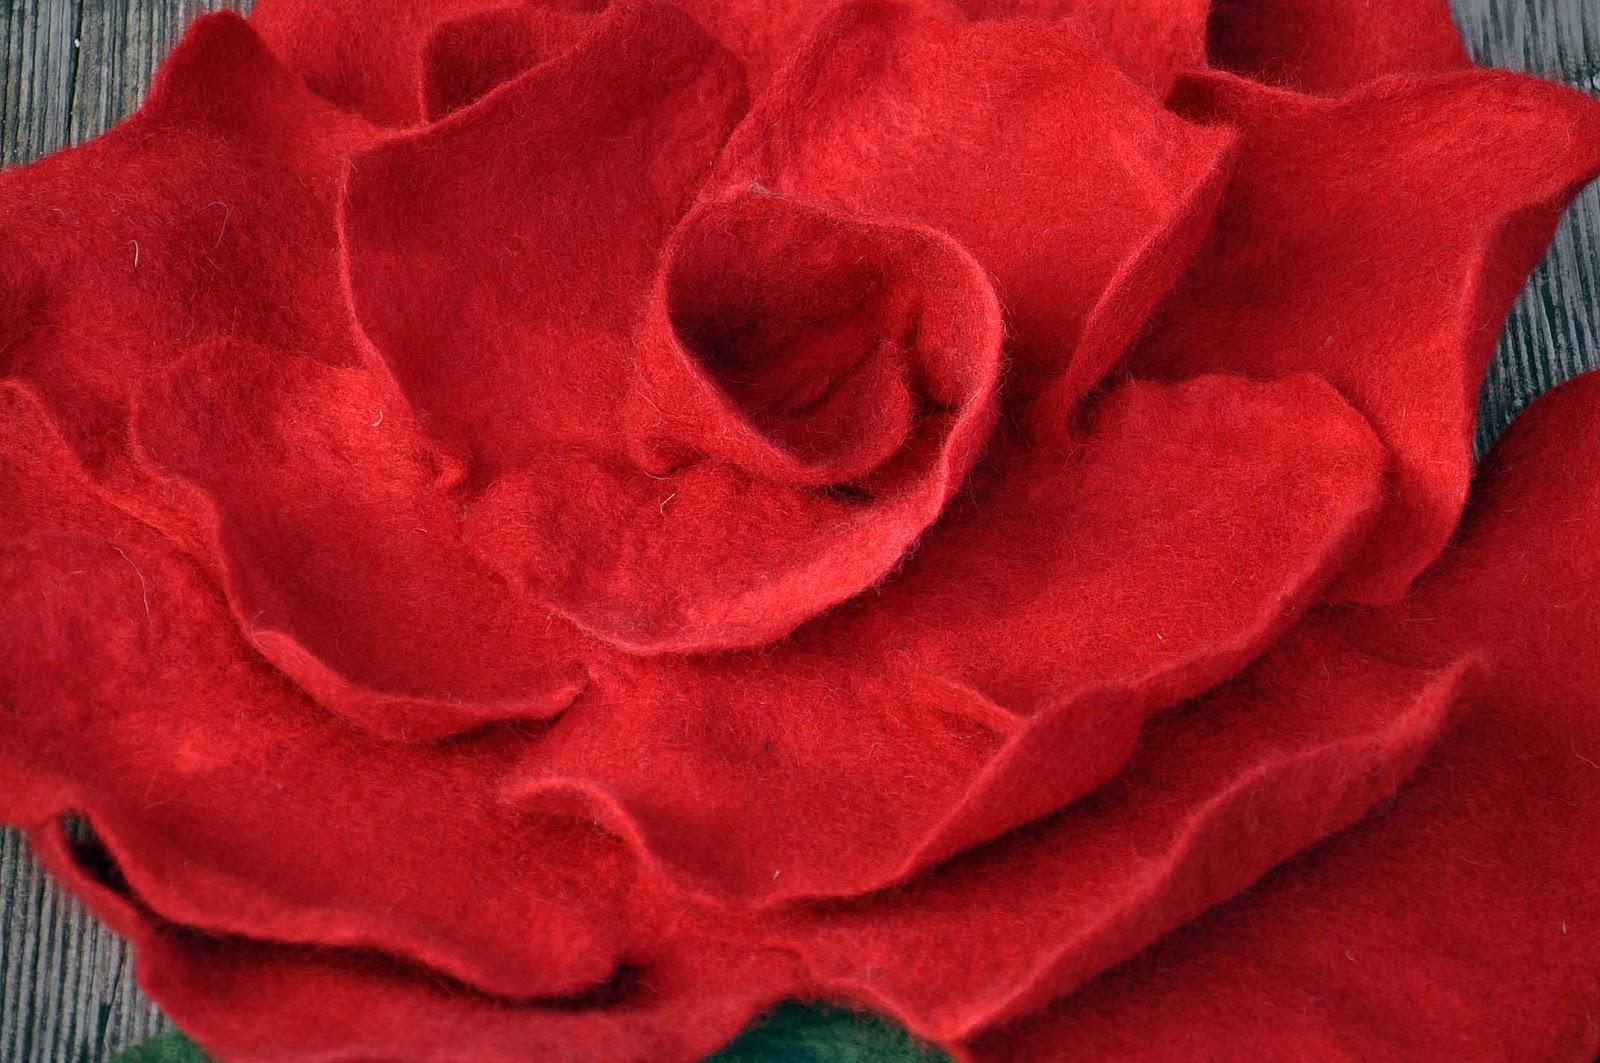 dornr schen filzunikate susanne karg rose mit blatt. Black Bedroom Furniture Sets. Home Design Ideas